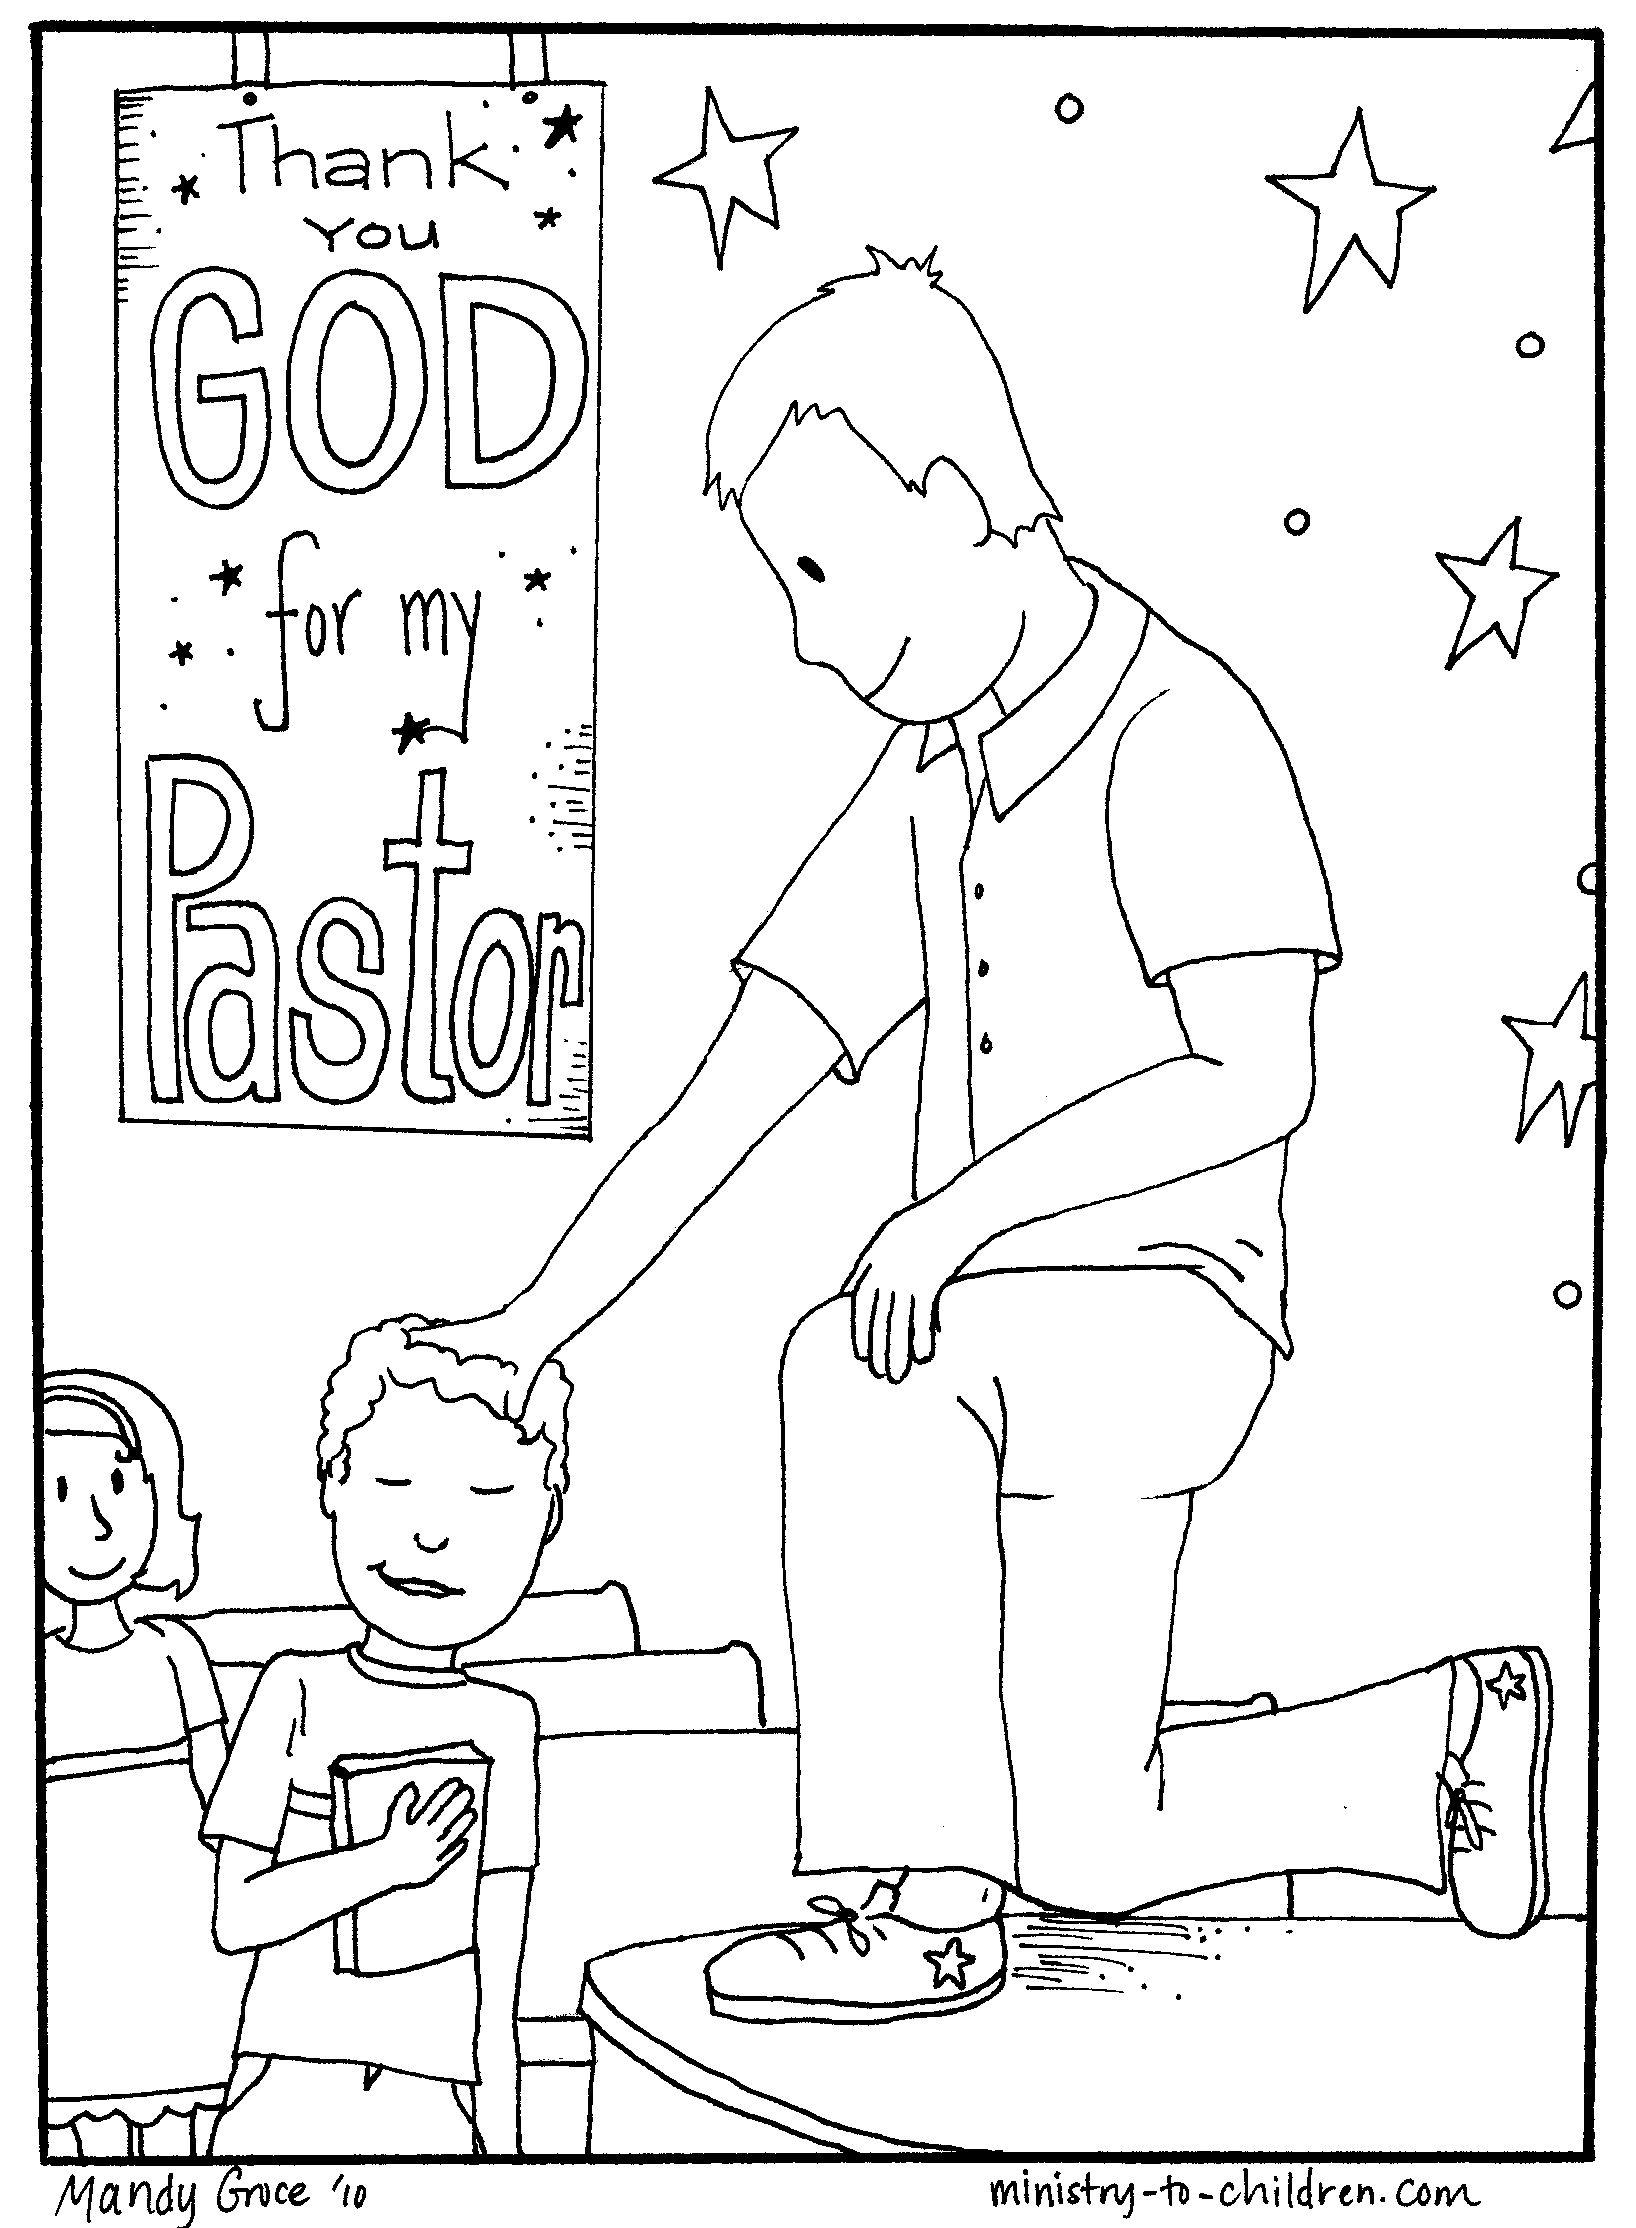 pastor-appreciation-coloring-page.jpg 1,636×2,228 pixels